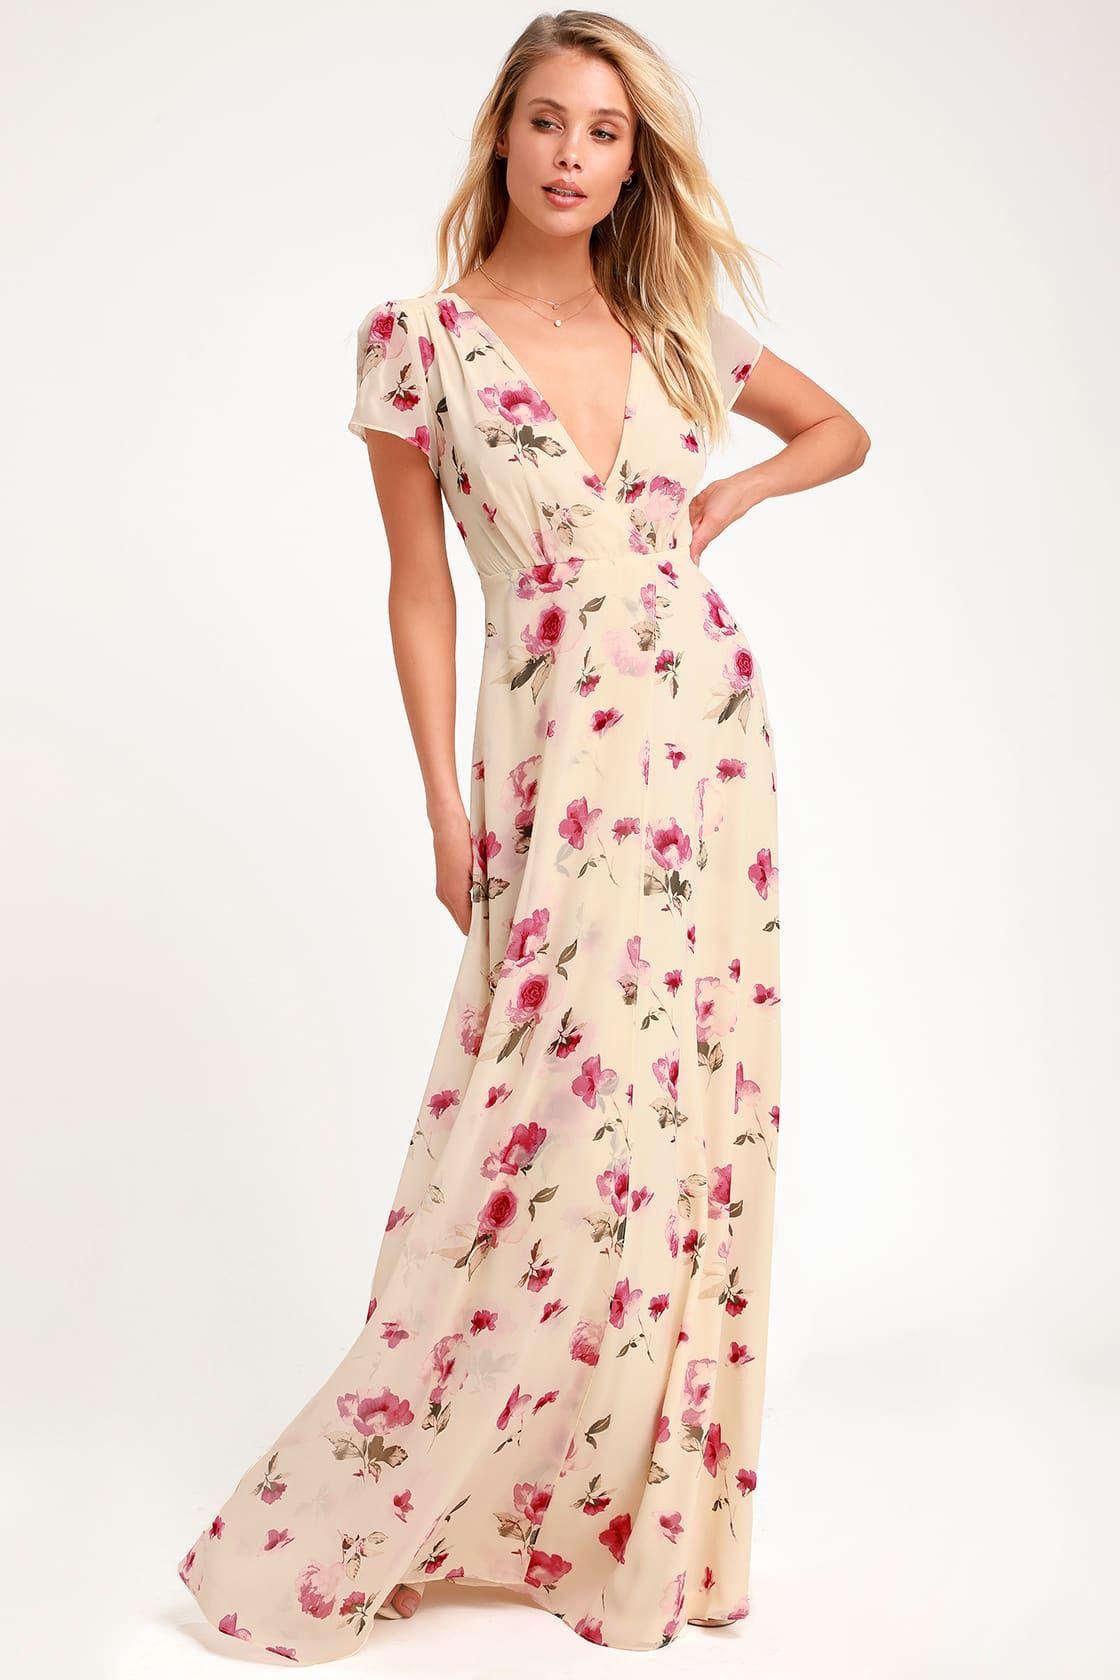 Gift of love cream floral print short sleeve maxi dress